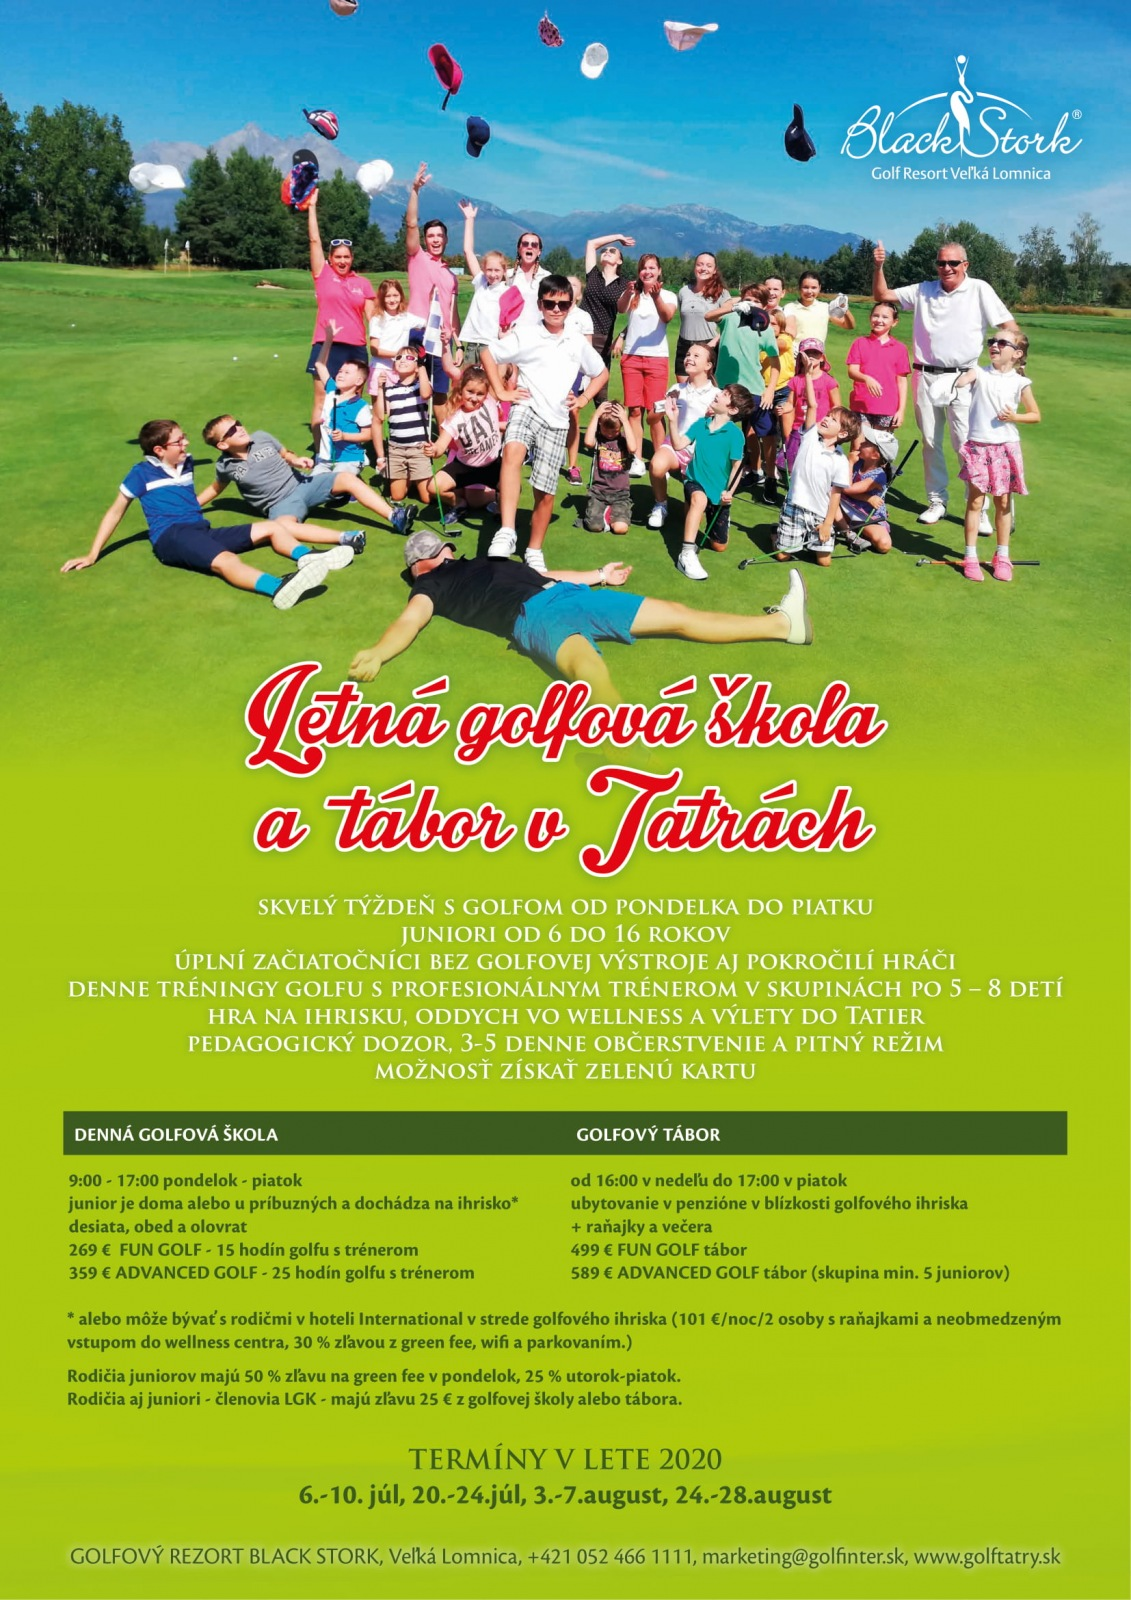 Detská letná golfová škola 20.-24.7.2020